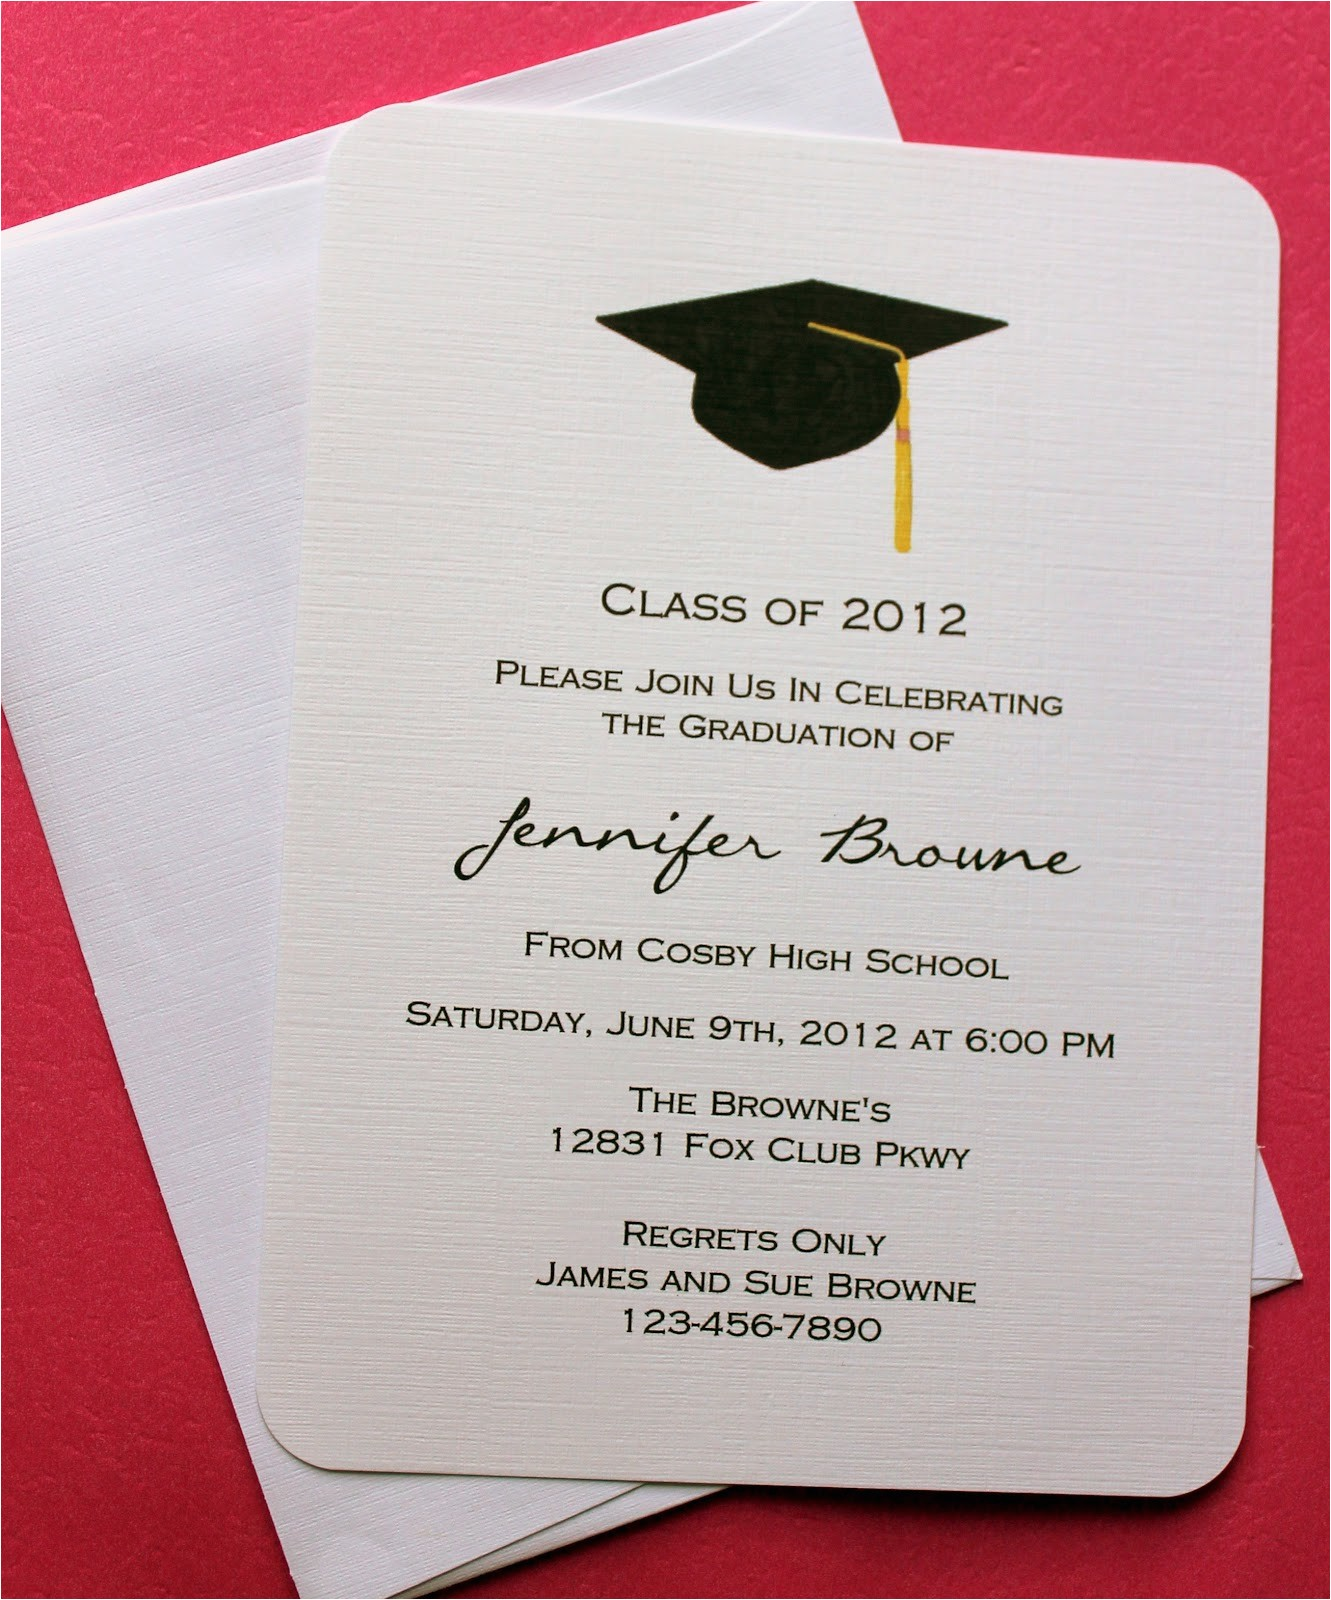 Evite Graduation Invitations Graduation Invitation Template Invitation Templates